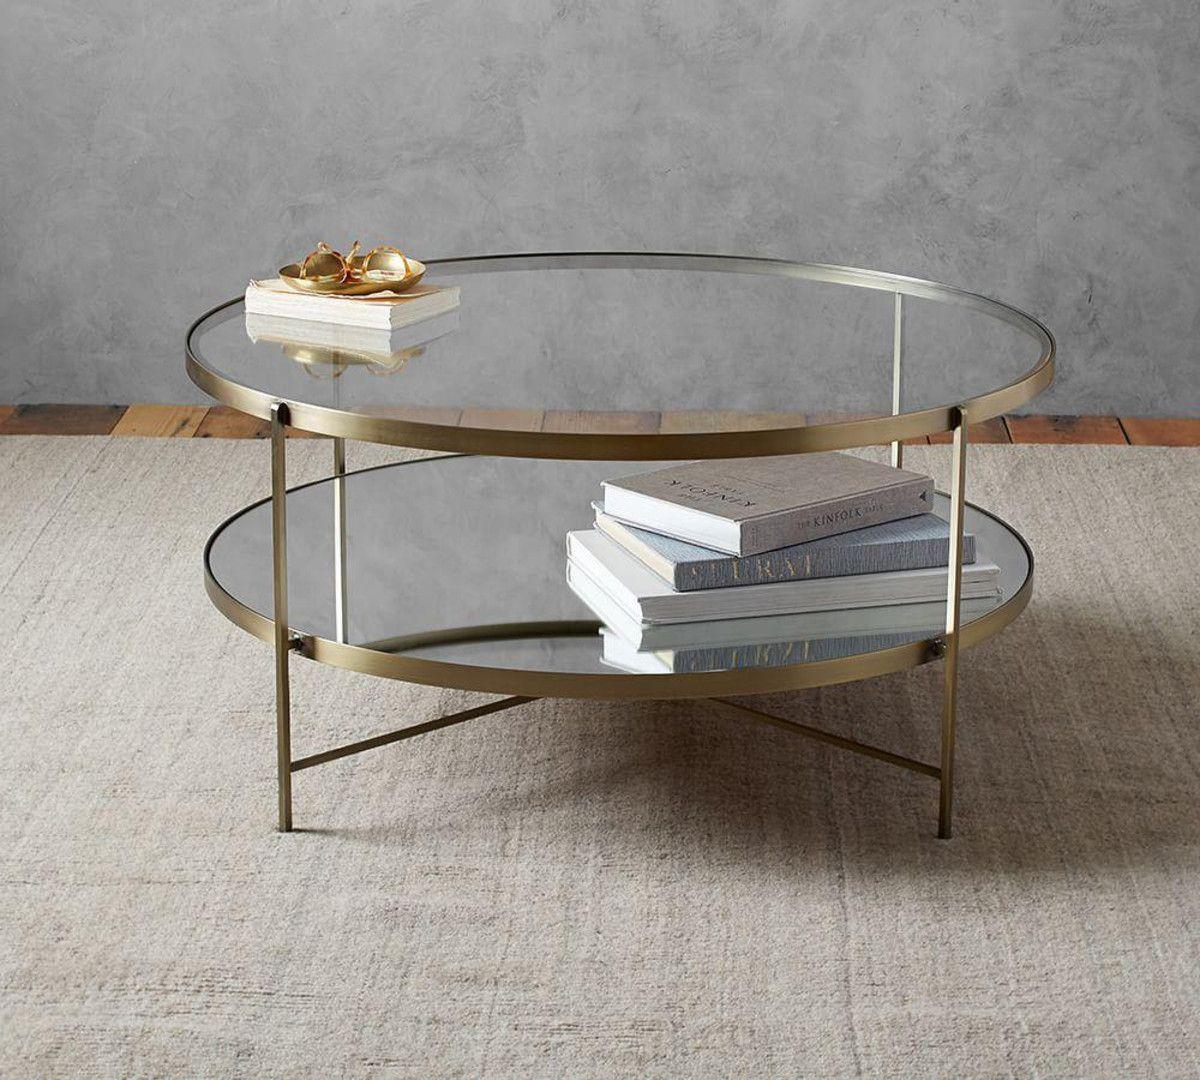 Leona Round Coffee Table Pottery Barn Au Coffee Table Inspiration Reclaimed Wood Coffee Table Brass Round Coffee Table [ 1080 x 1200 Pixel ]